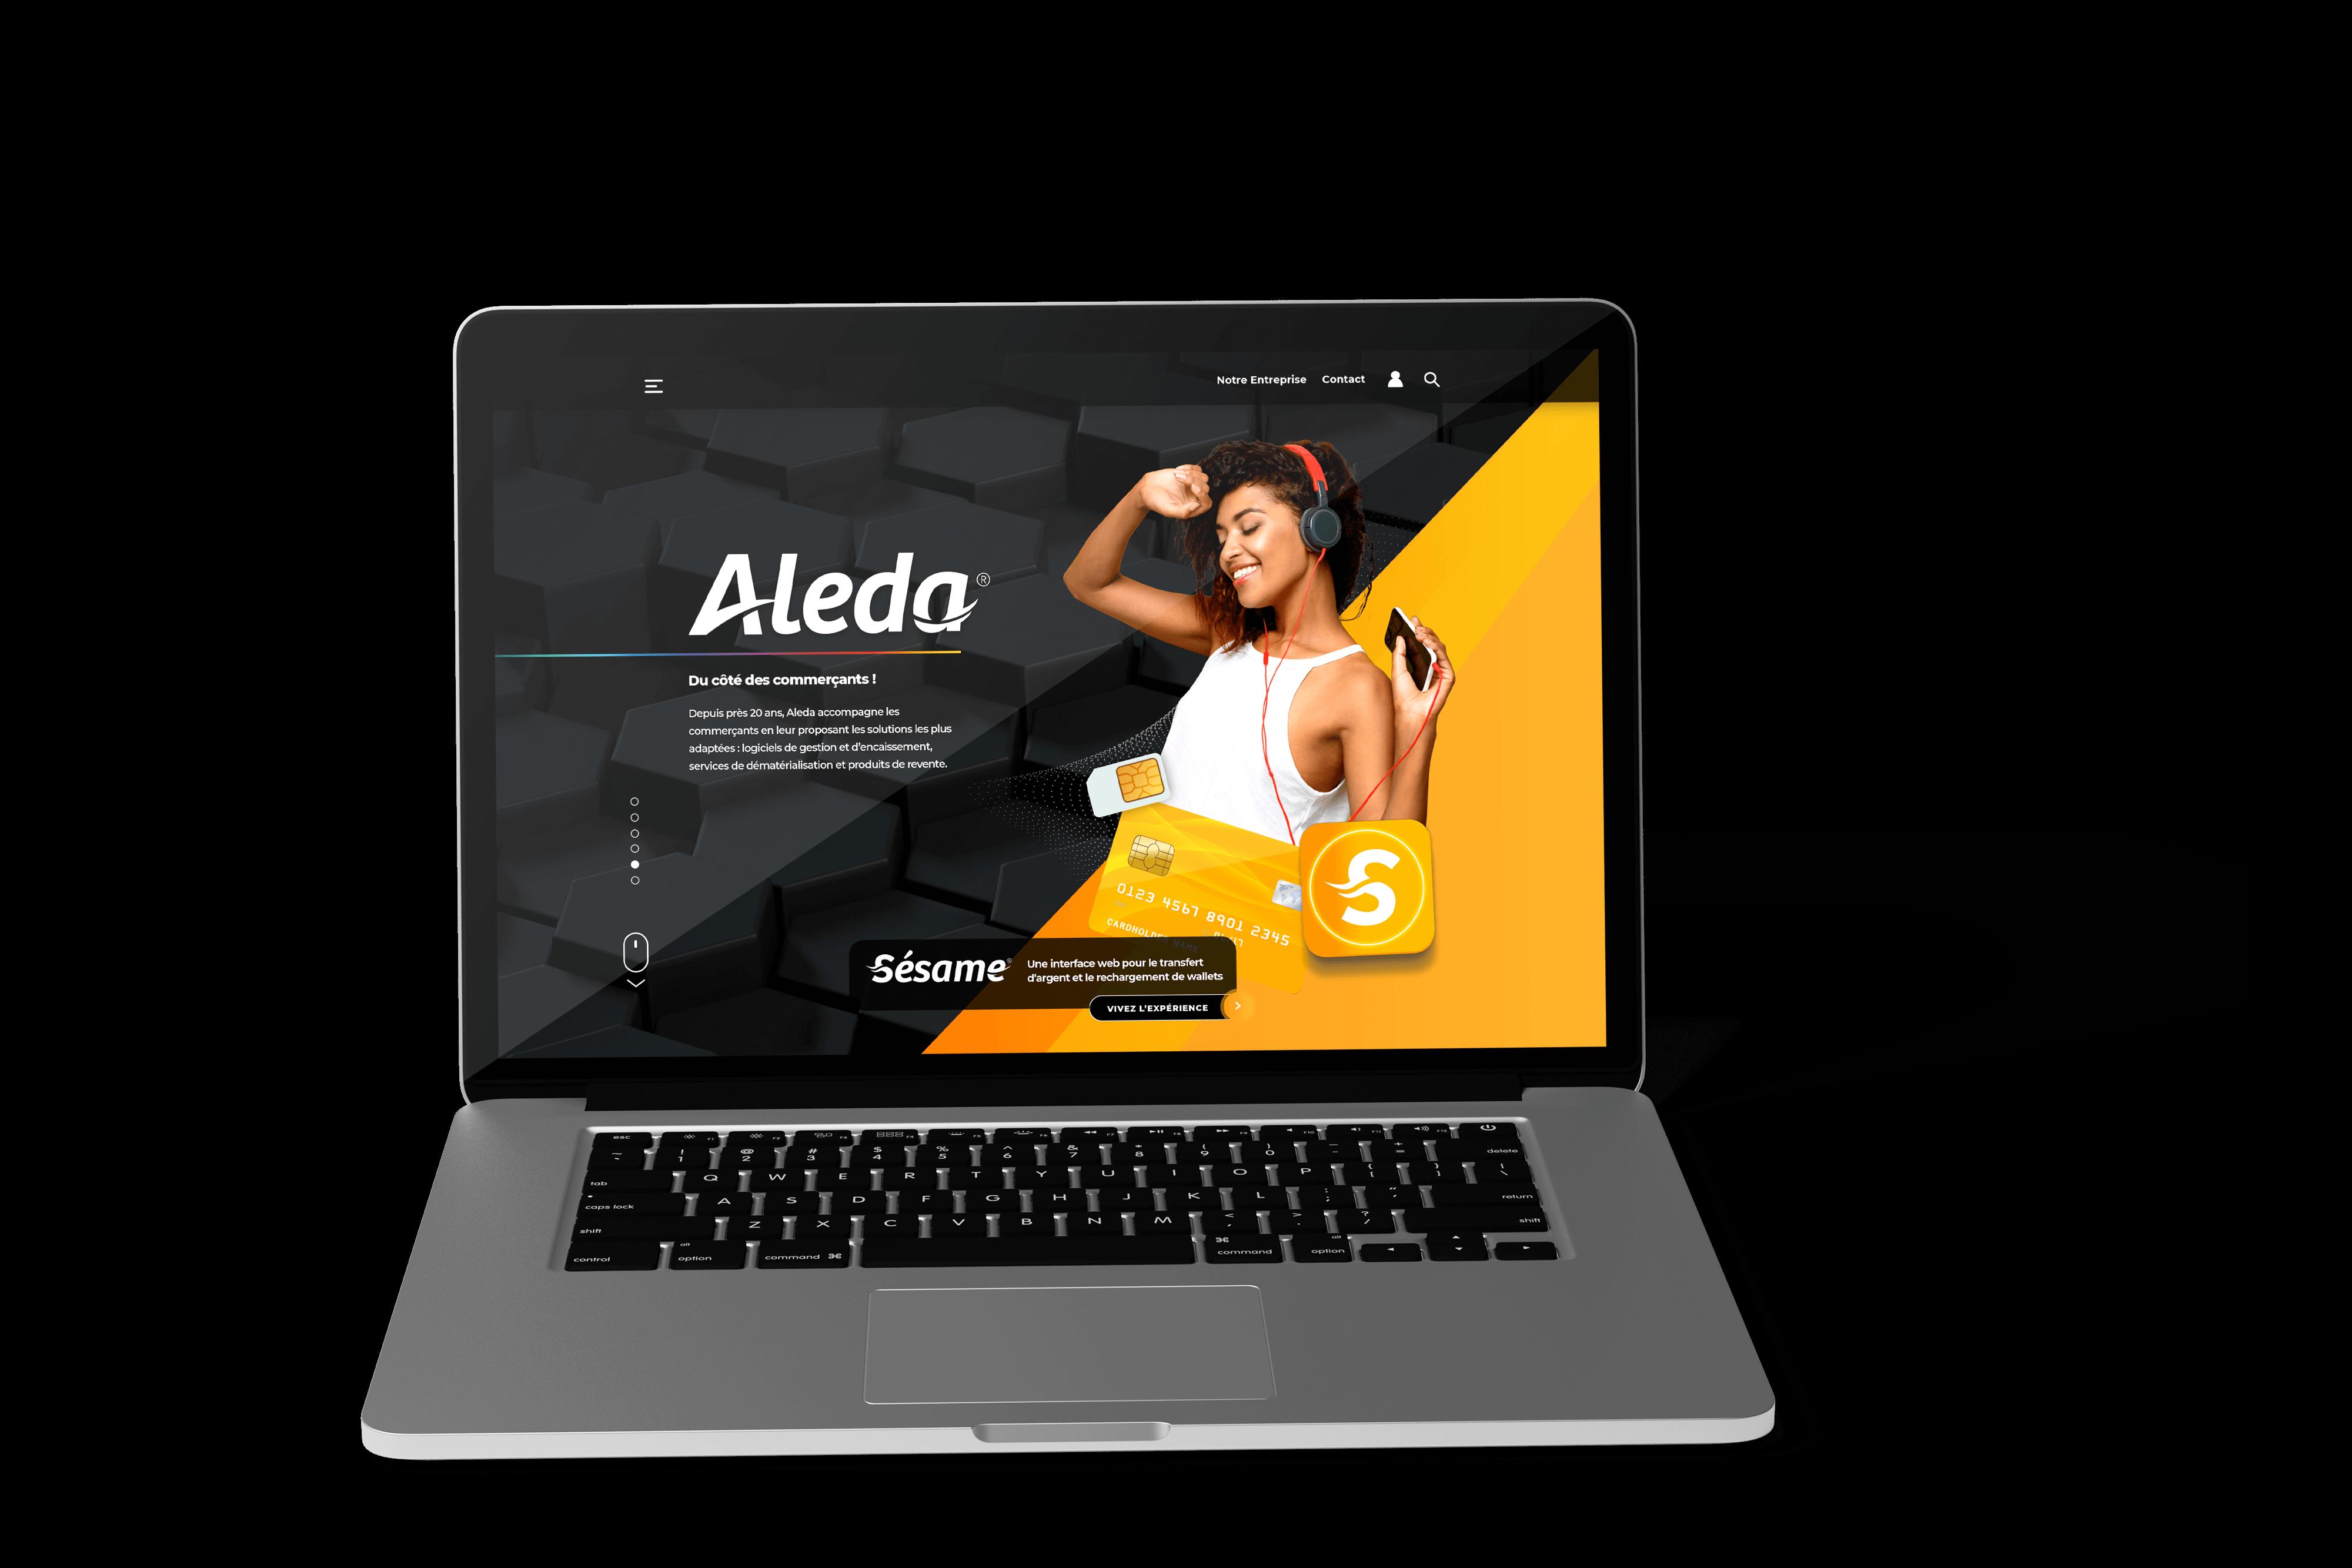 aleda-site-web-maquettes-digital-identite-visuelle